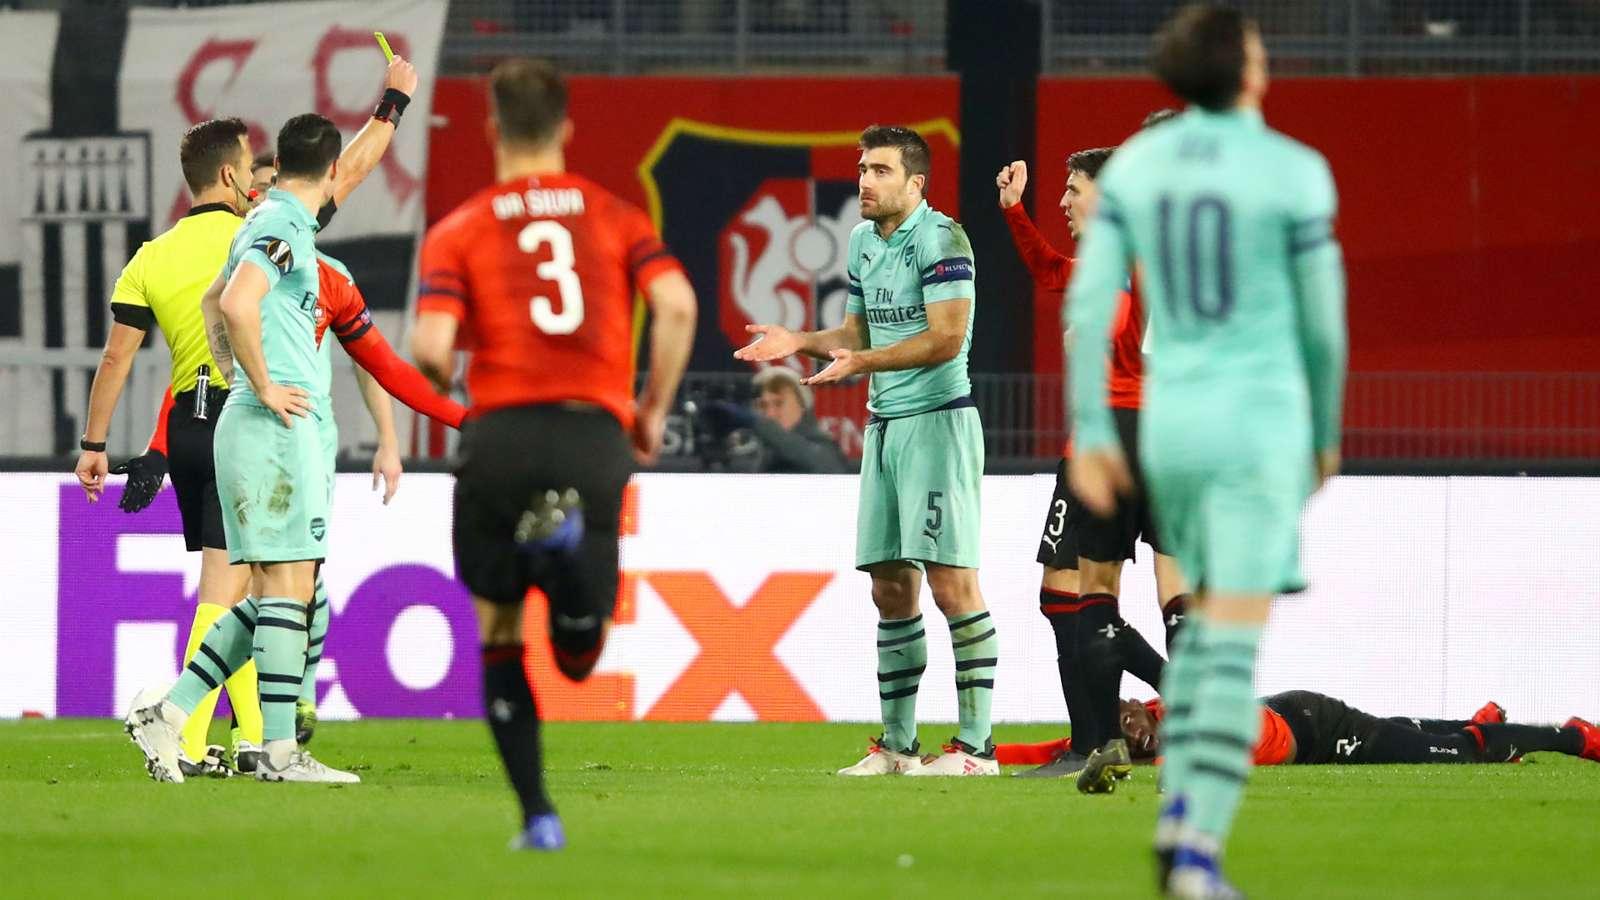 sokratis cropped isds7ztcar6f1kuac9yl3bgpn - Rennes vs Arsenal 3-1: UEFA Europa League Report & Highlights [Video]